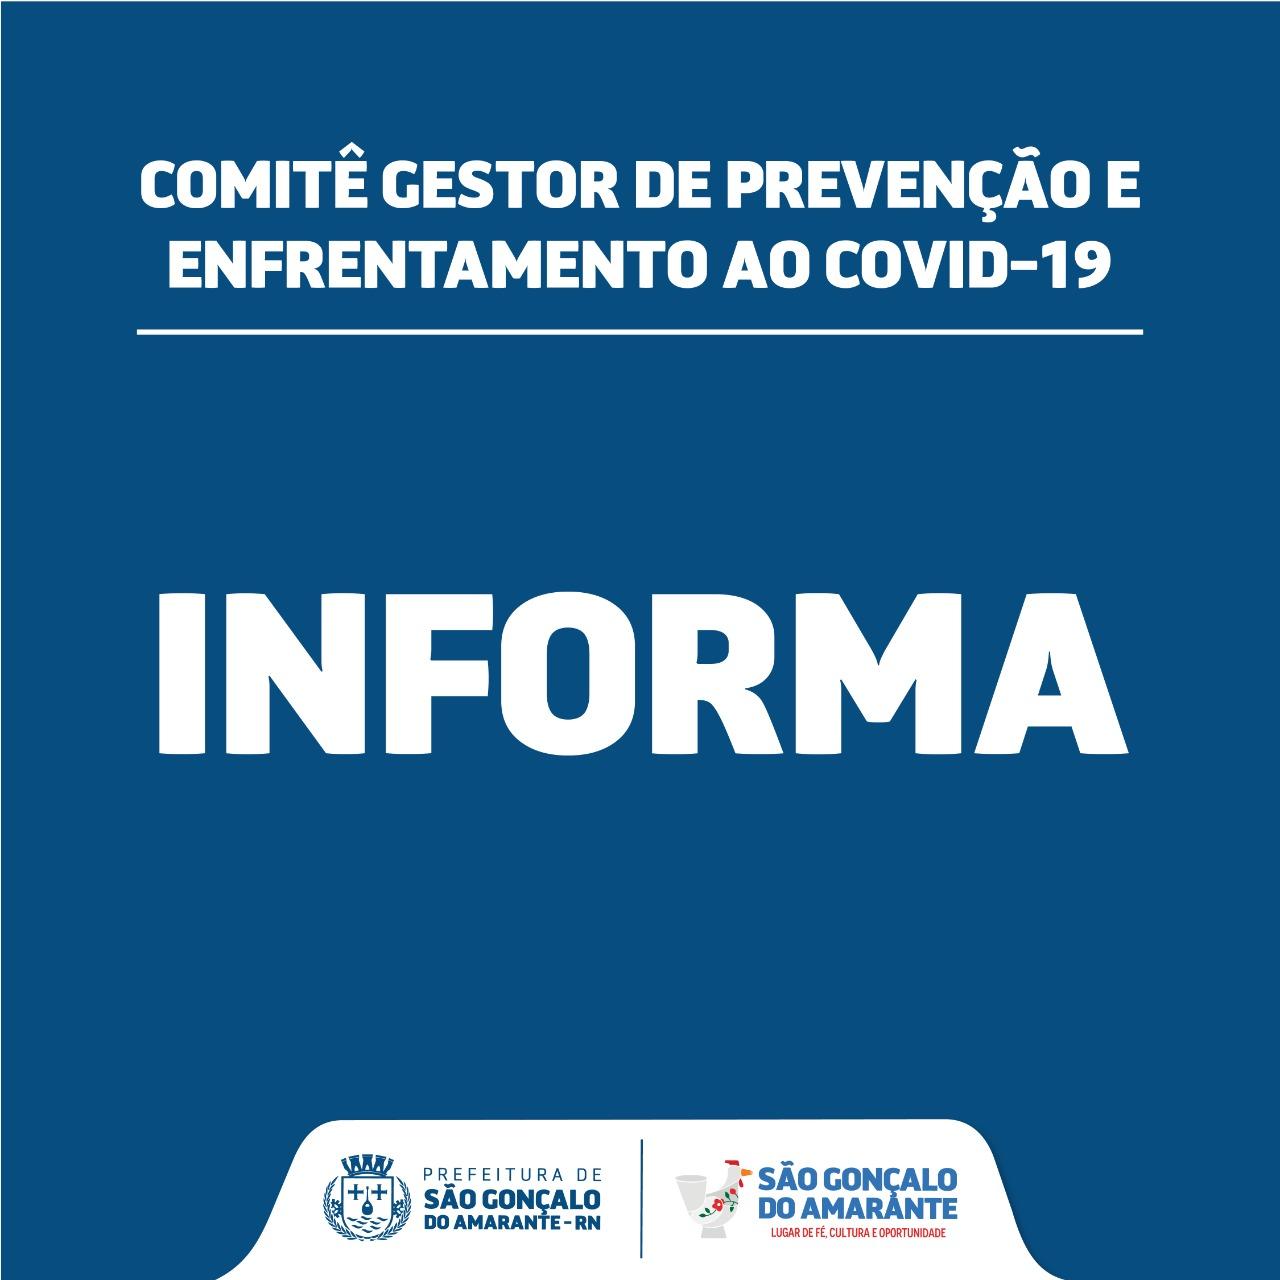 Comitê Gestor divulga boletim informativo sobre Covid-19 no município